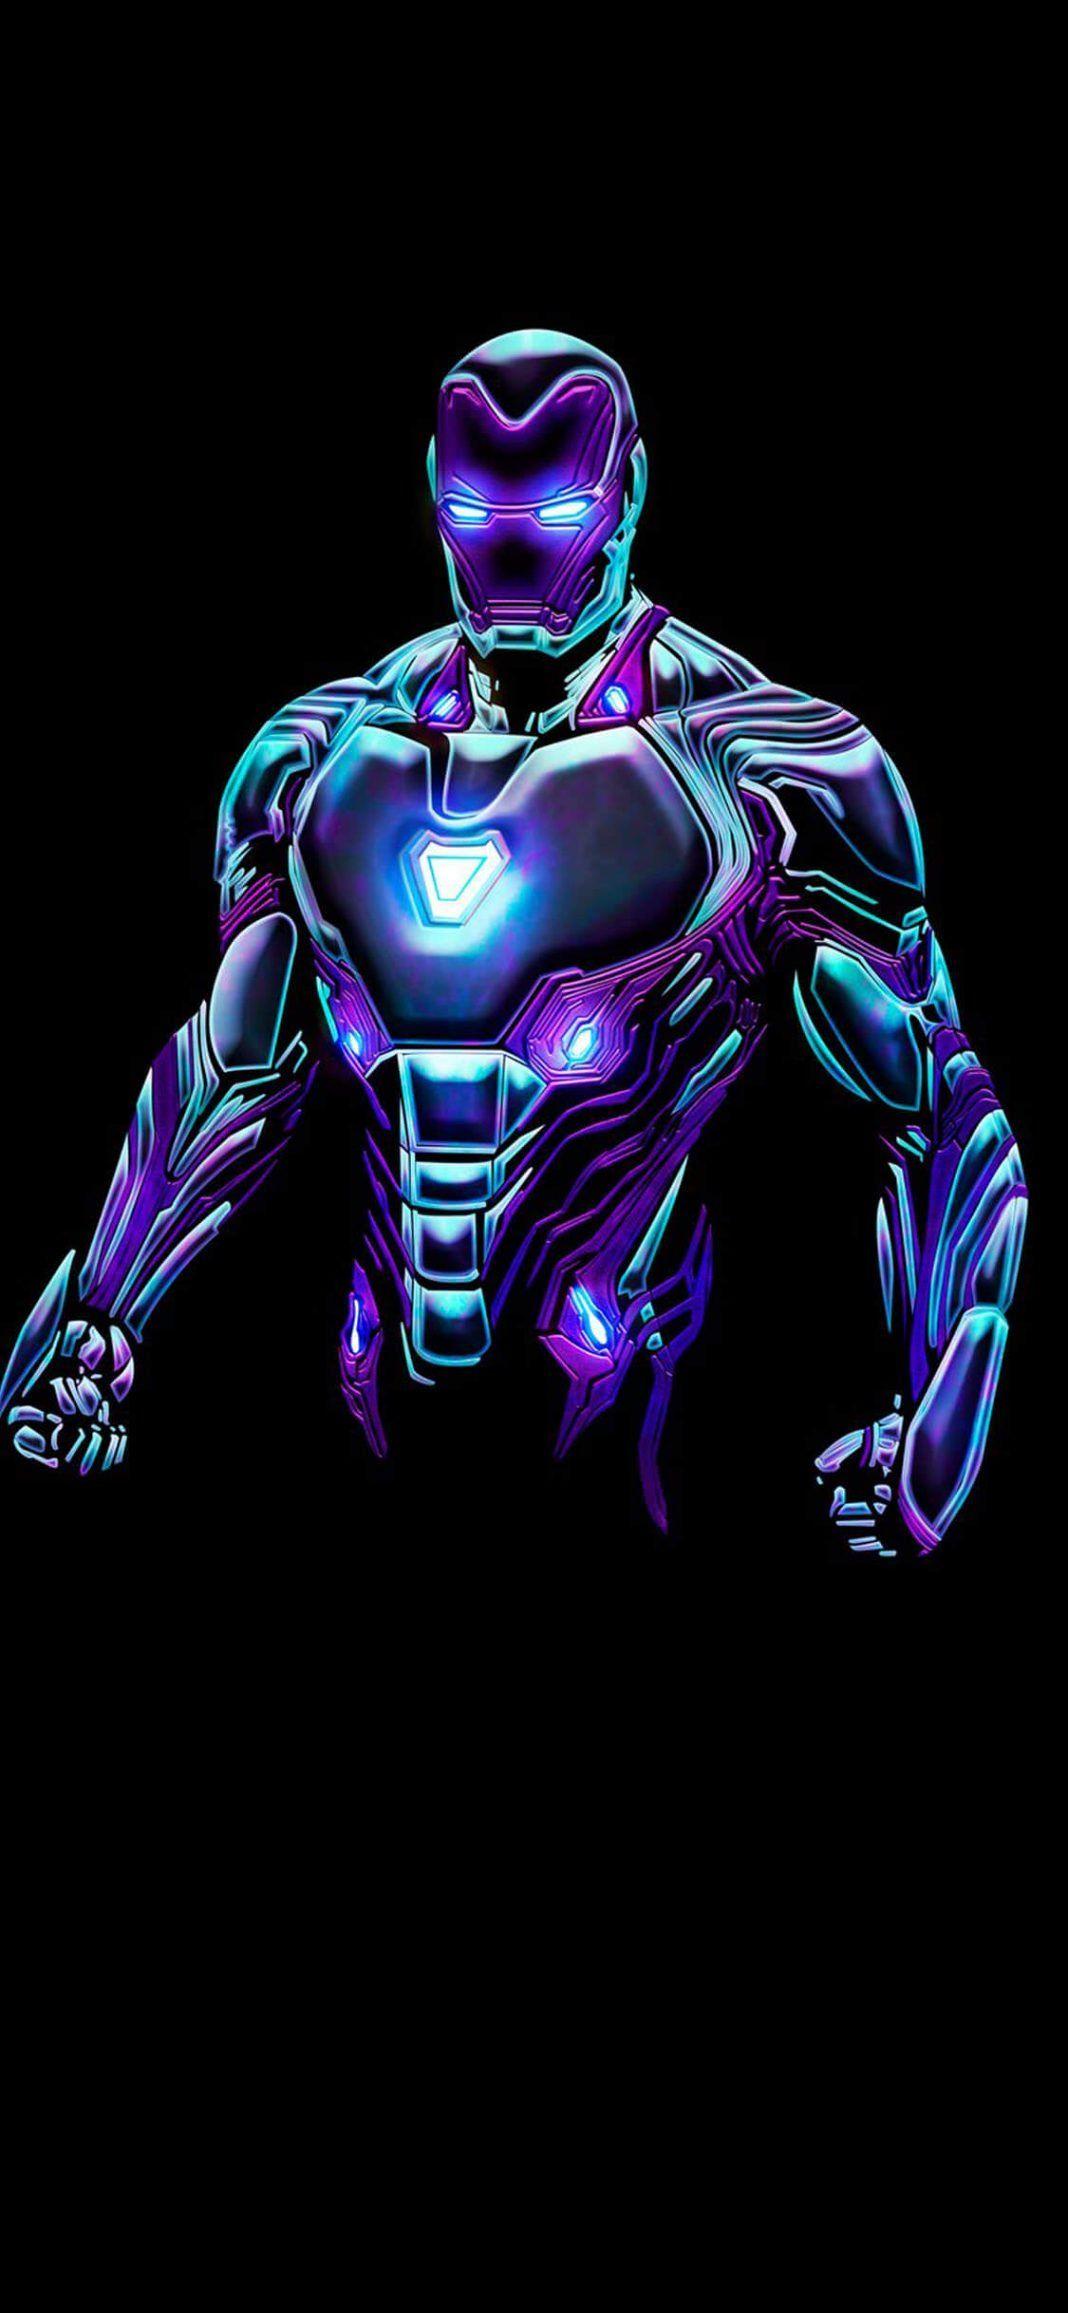 35 Best Iron Man Iphone Wallpapers 2019 Iron Man Hd Wallpaper Iron Man Wallpaper Iron Man Art